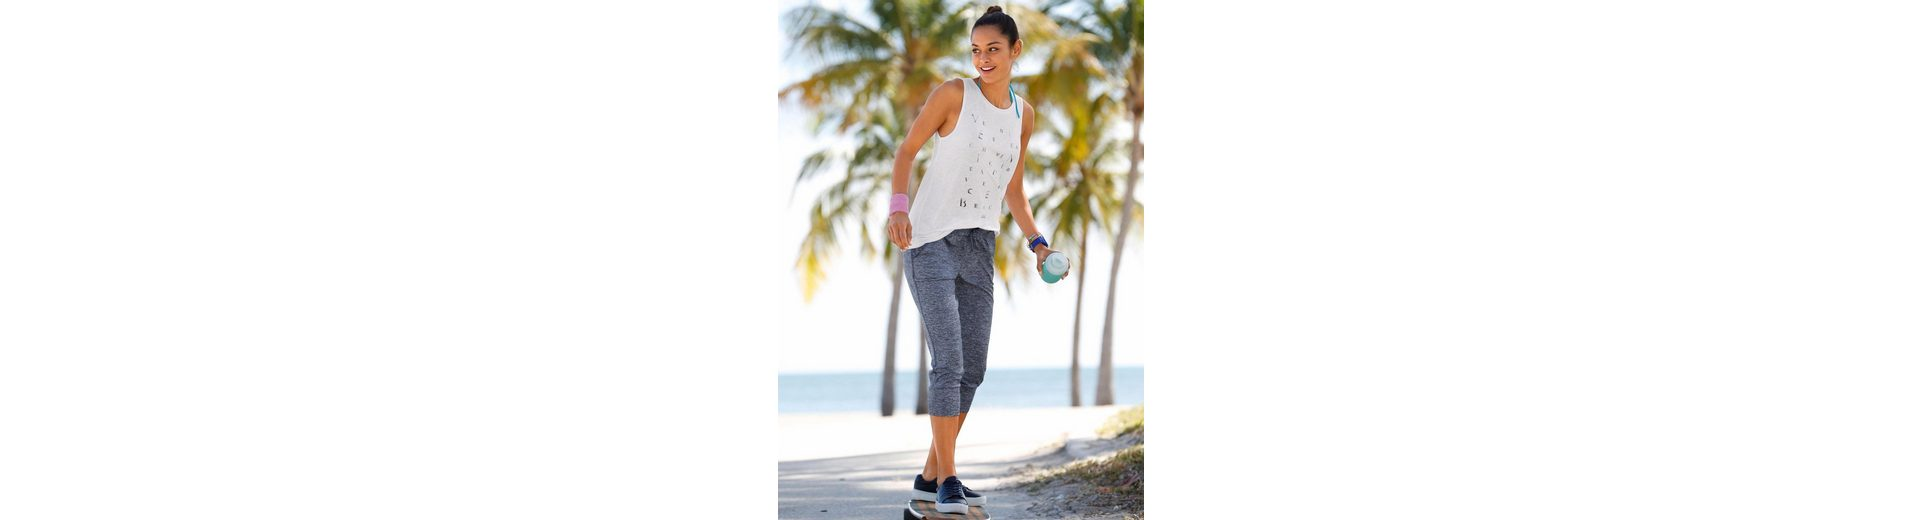 Venice Beach Strandhose Verkauf 2018 Bester Großhandel Günstig Online 24CSXEH